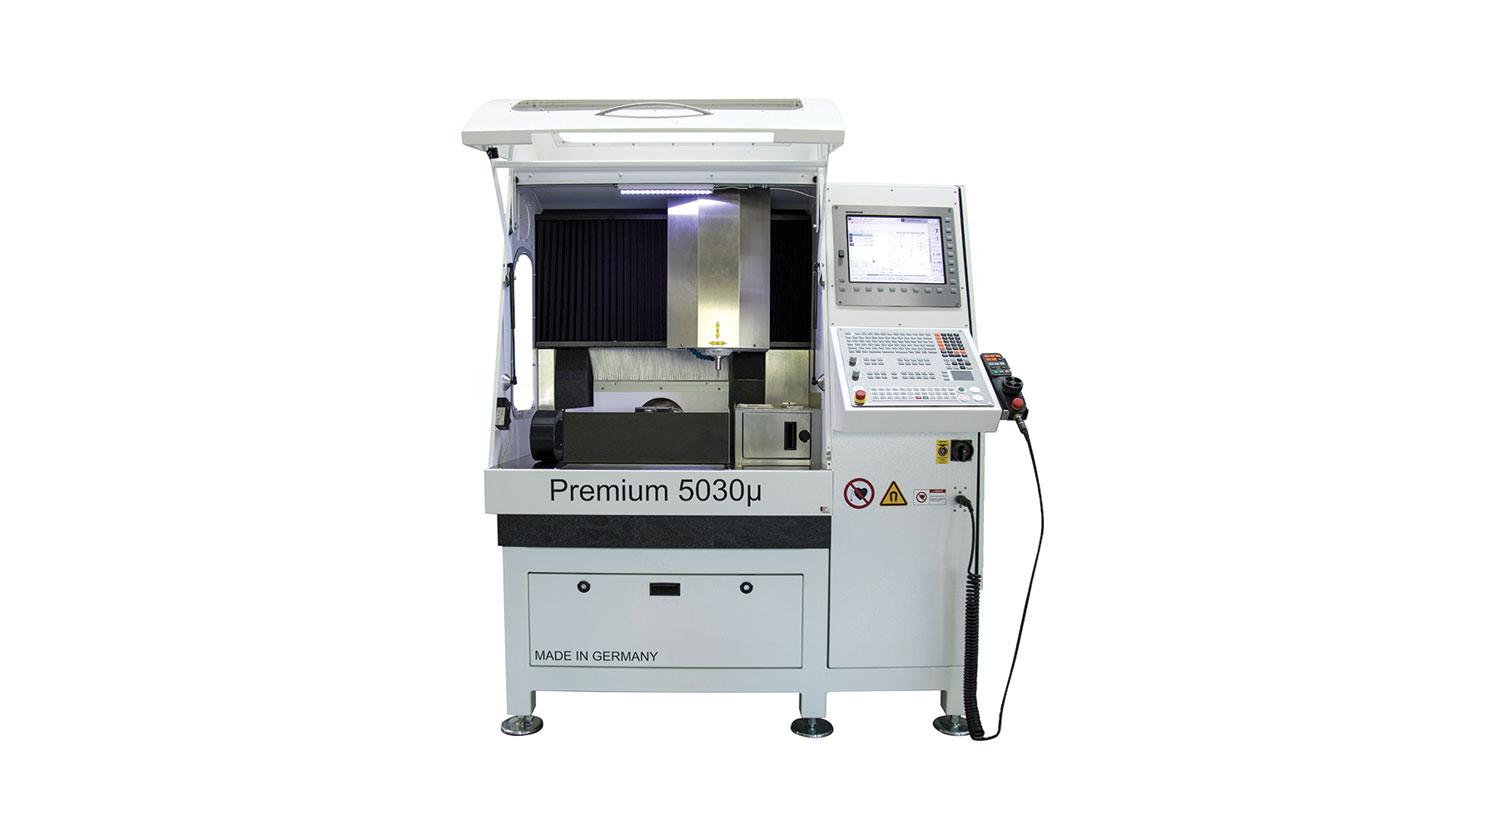 INT micro milling rapid prototyping CNC Imes Icore Premium 5030µ